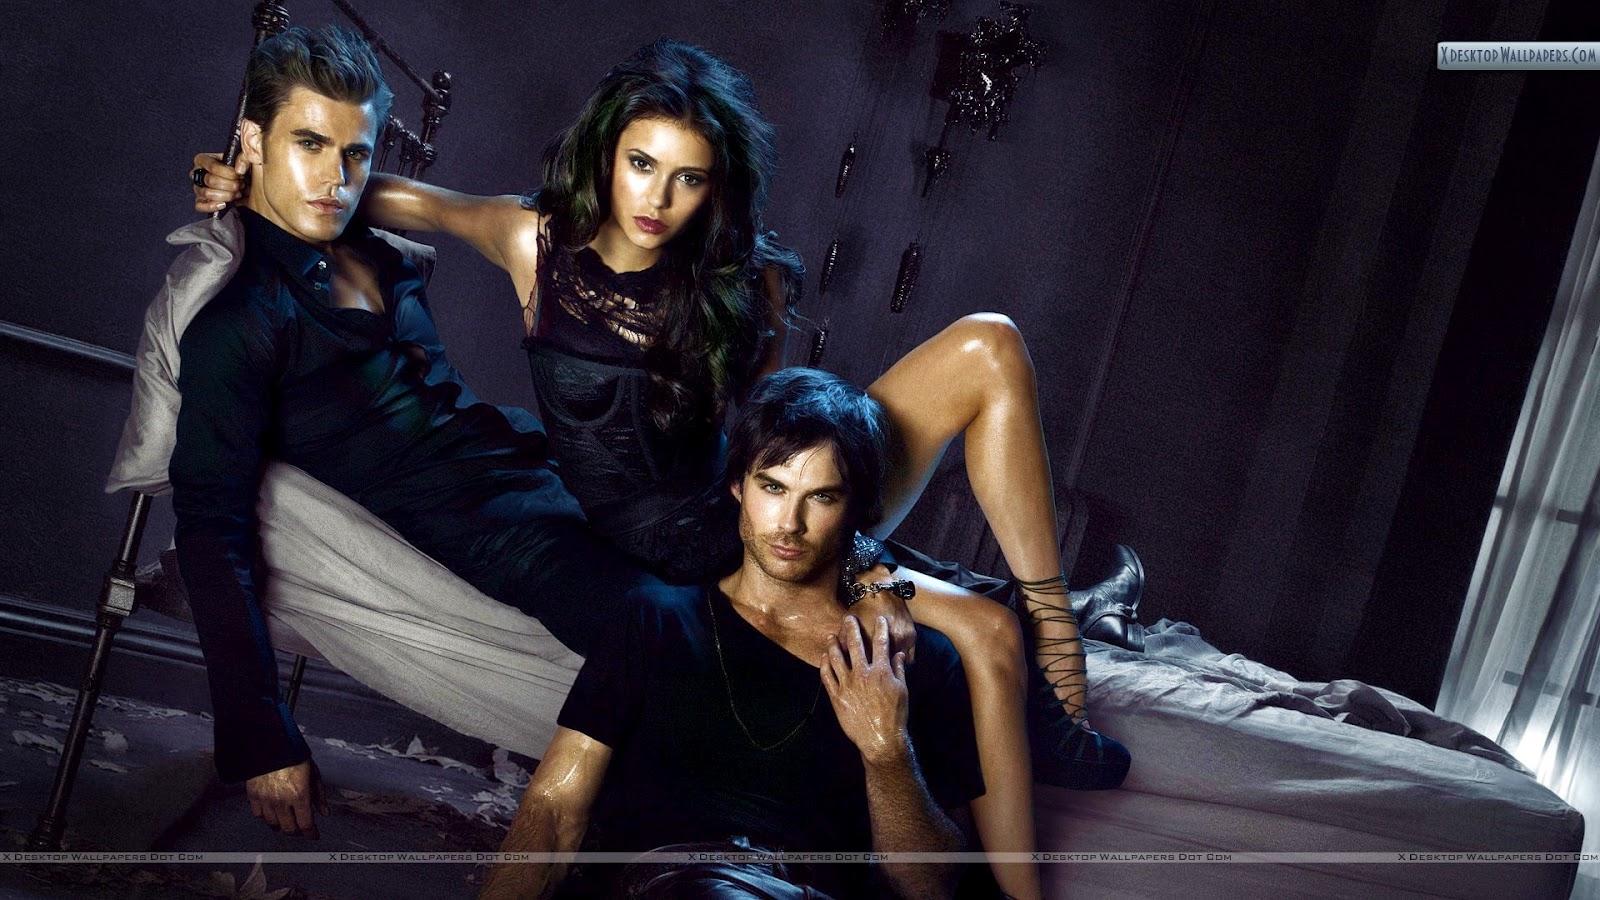 Download Wallpapers Vampire Diaries Wallpapers 1600x900